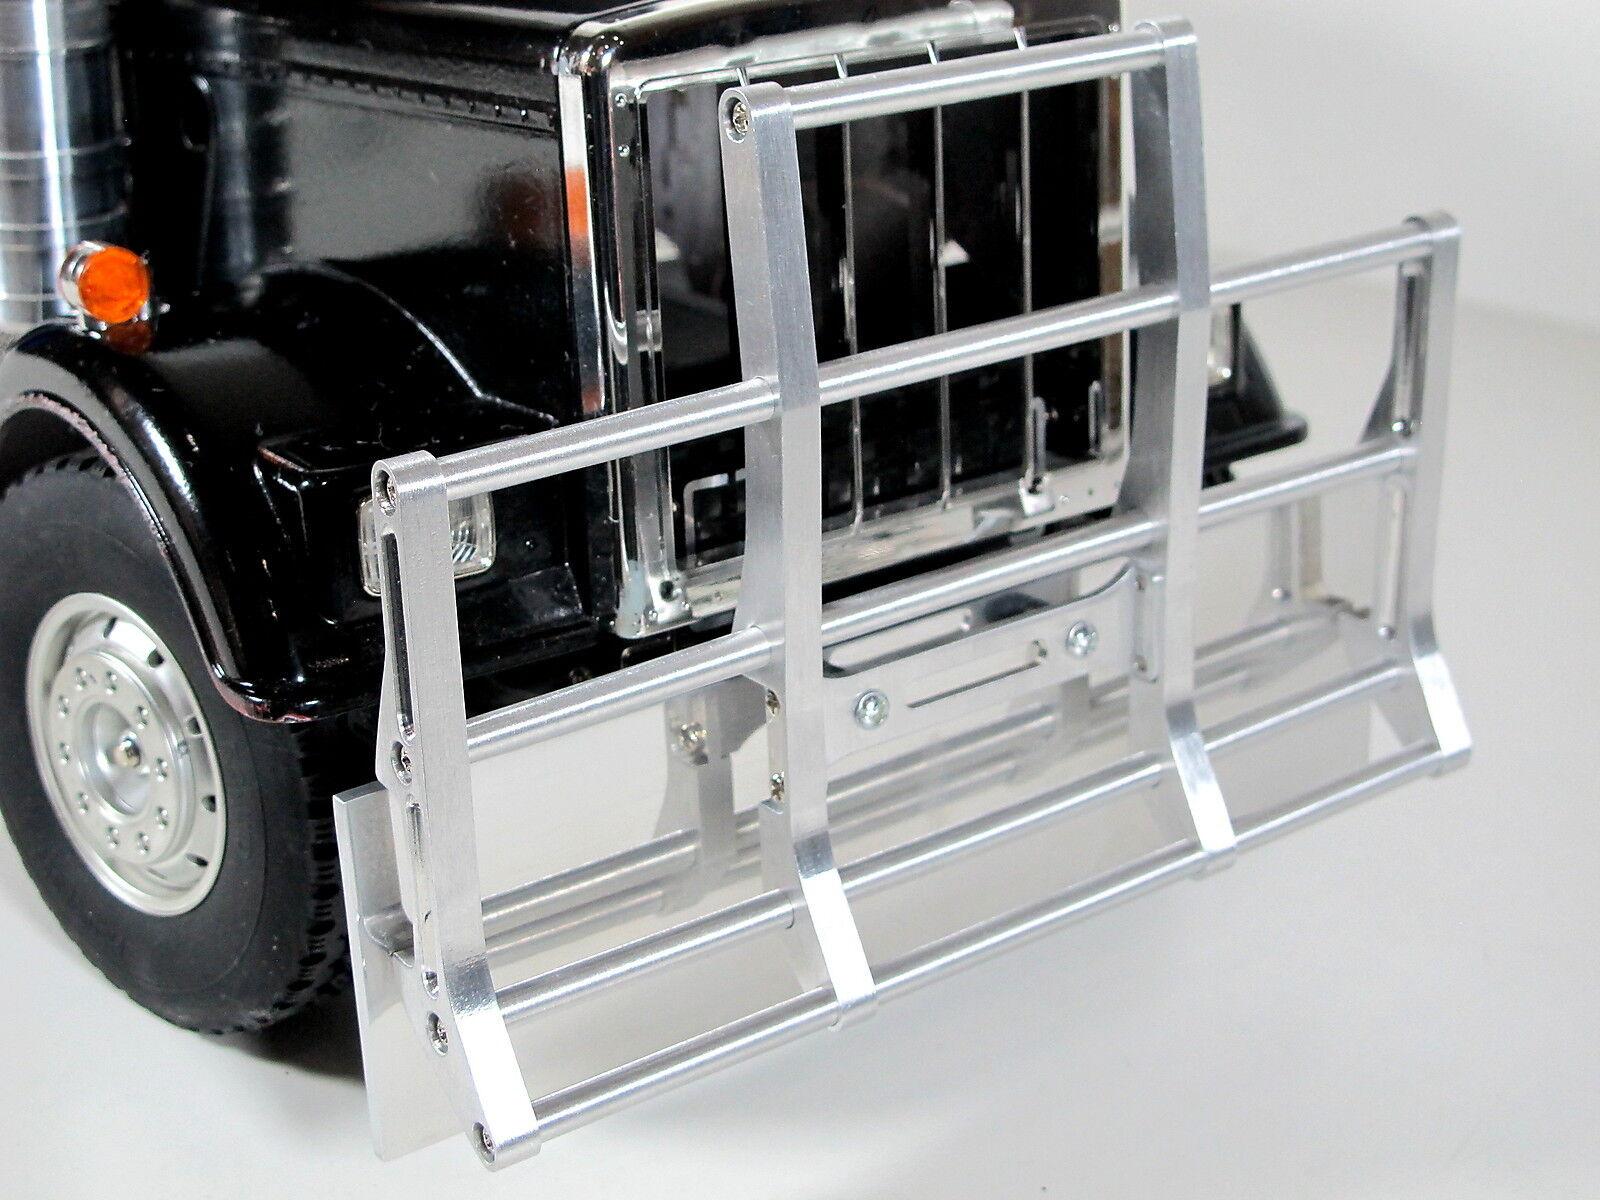 Aluminum davanti Bumper Plate Plate Plate + Prossoection Guard Tamiya R C 1 14 re Gre Hauler a4ec25